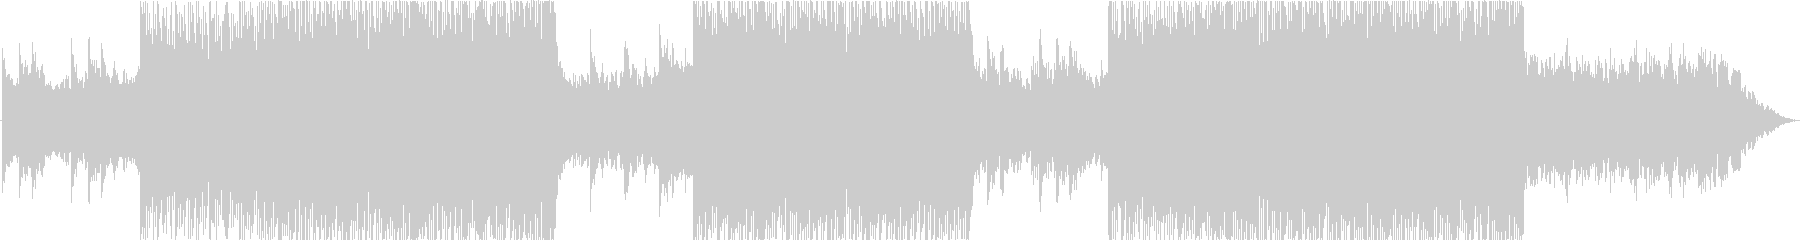 【BGM】kawaii bassの未再生の波形